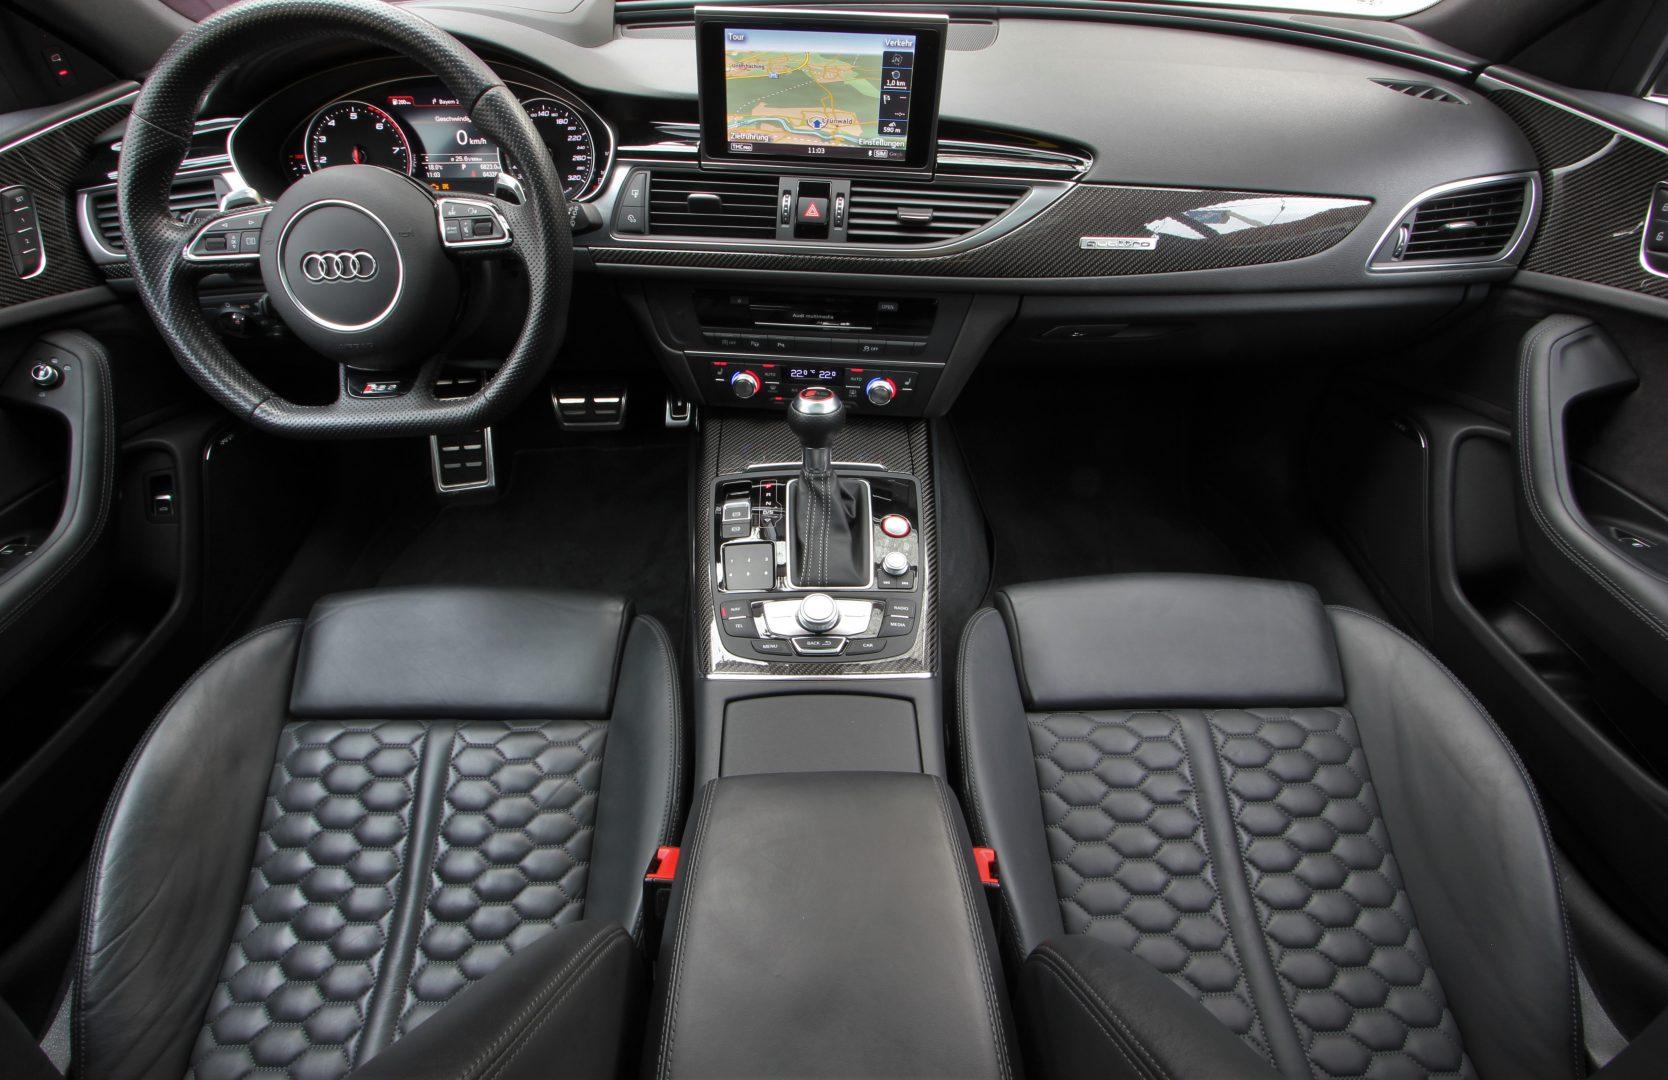 AIL Audi RS6 Avant Performance 4.0 TFSI Carbon Paket  13